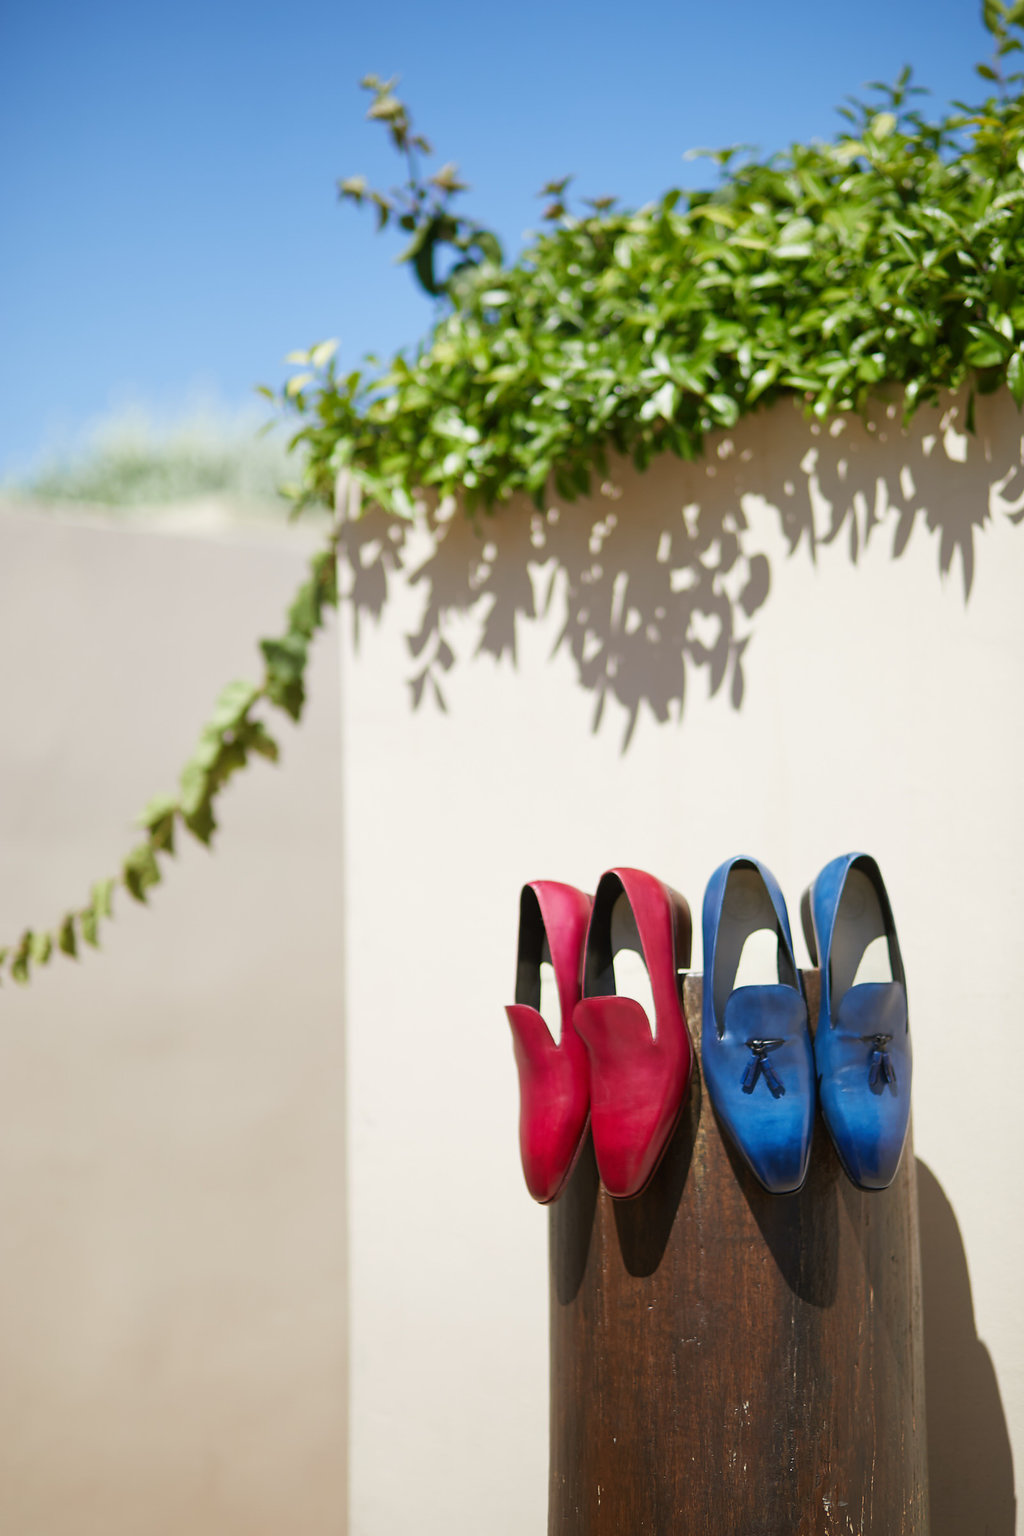 groom wedding shoes - photo by Sotiris Tsakanikas http://ruffledblog.com/chic-sunset-wedding-on-the-athens-riviera